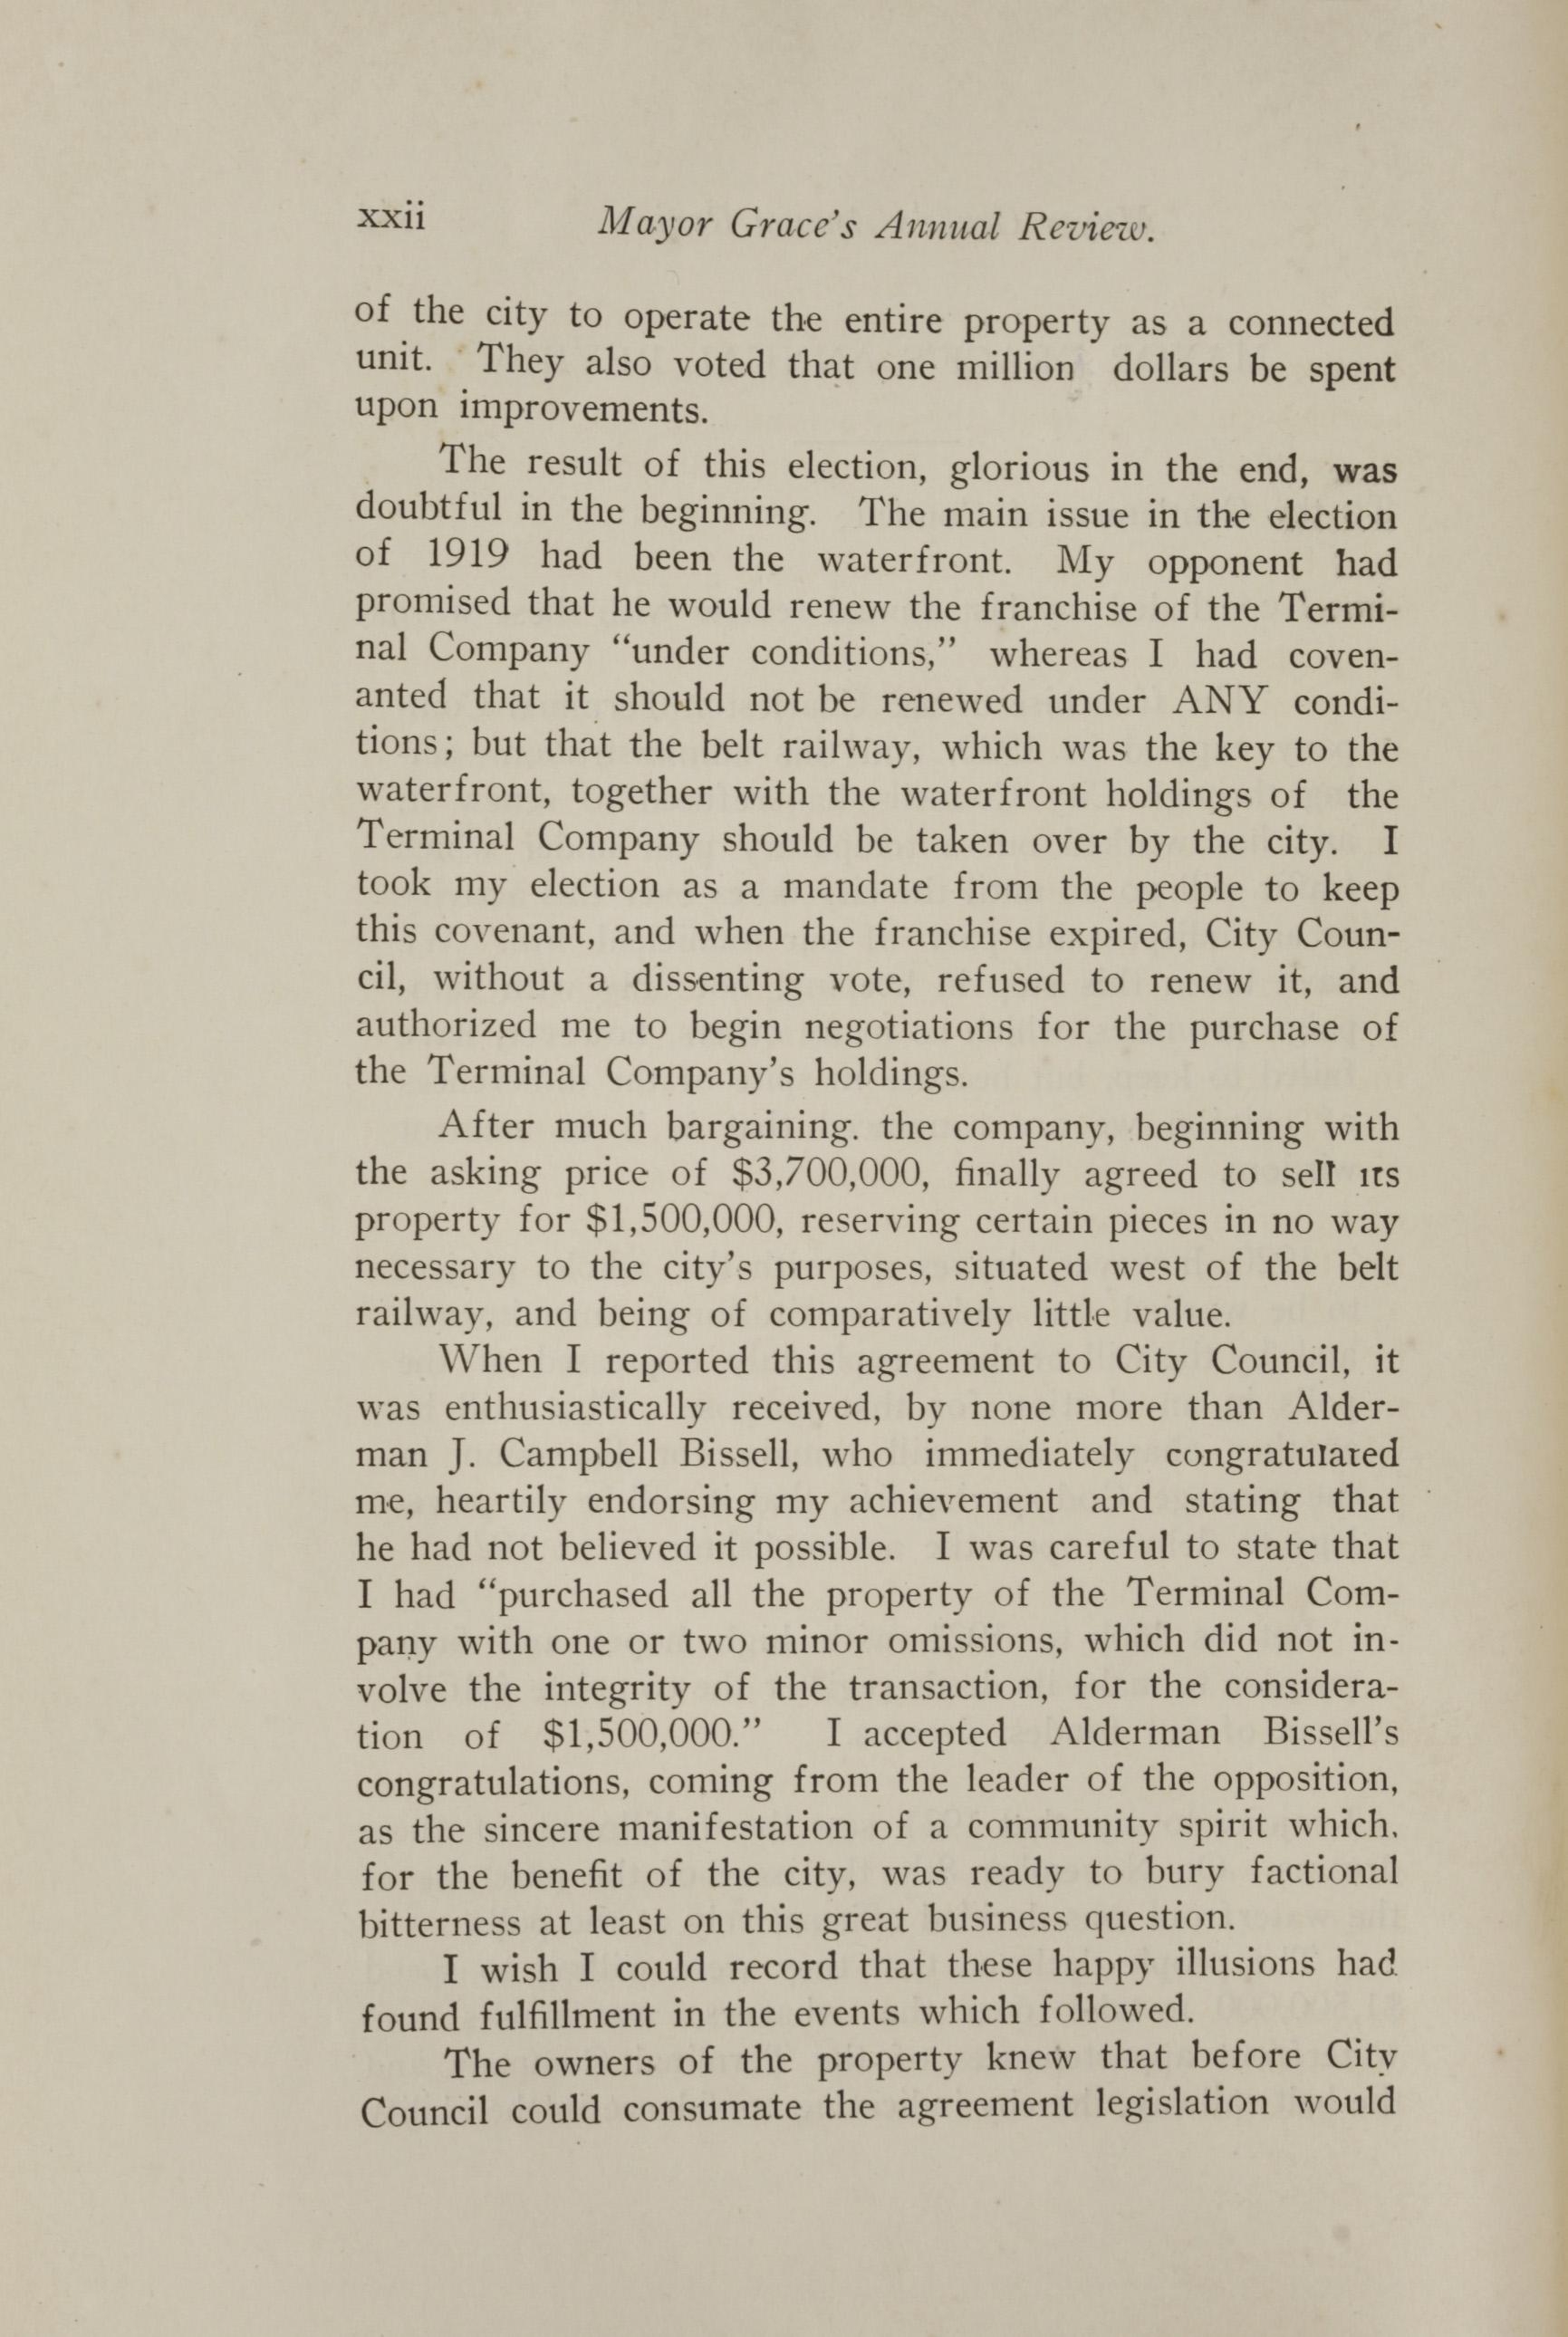 Charleston Yearbook, 1921, page xxii